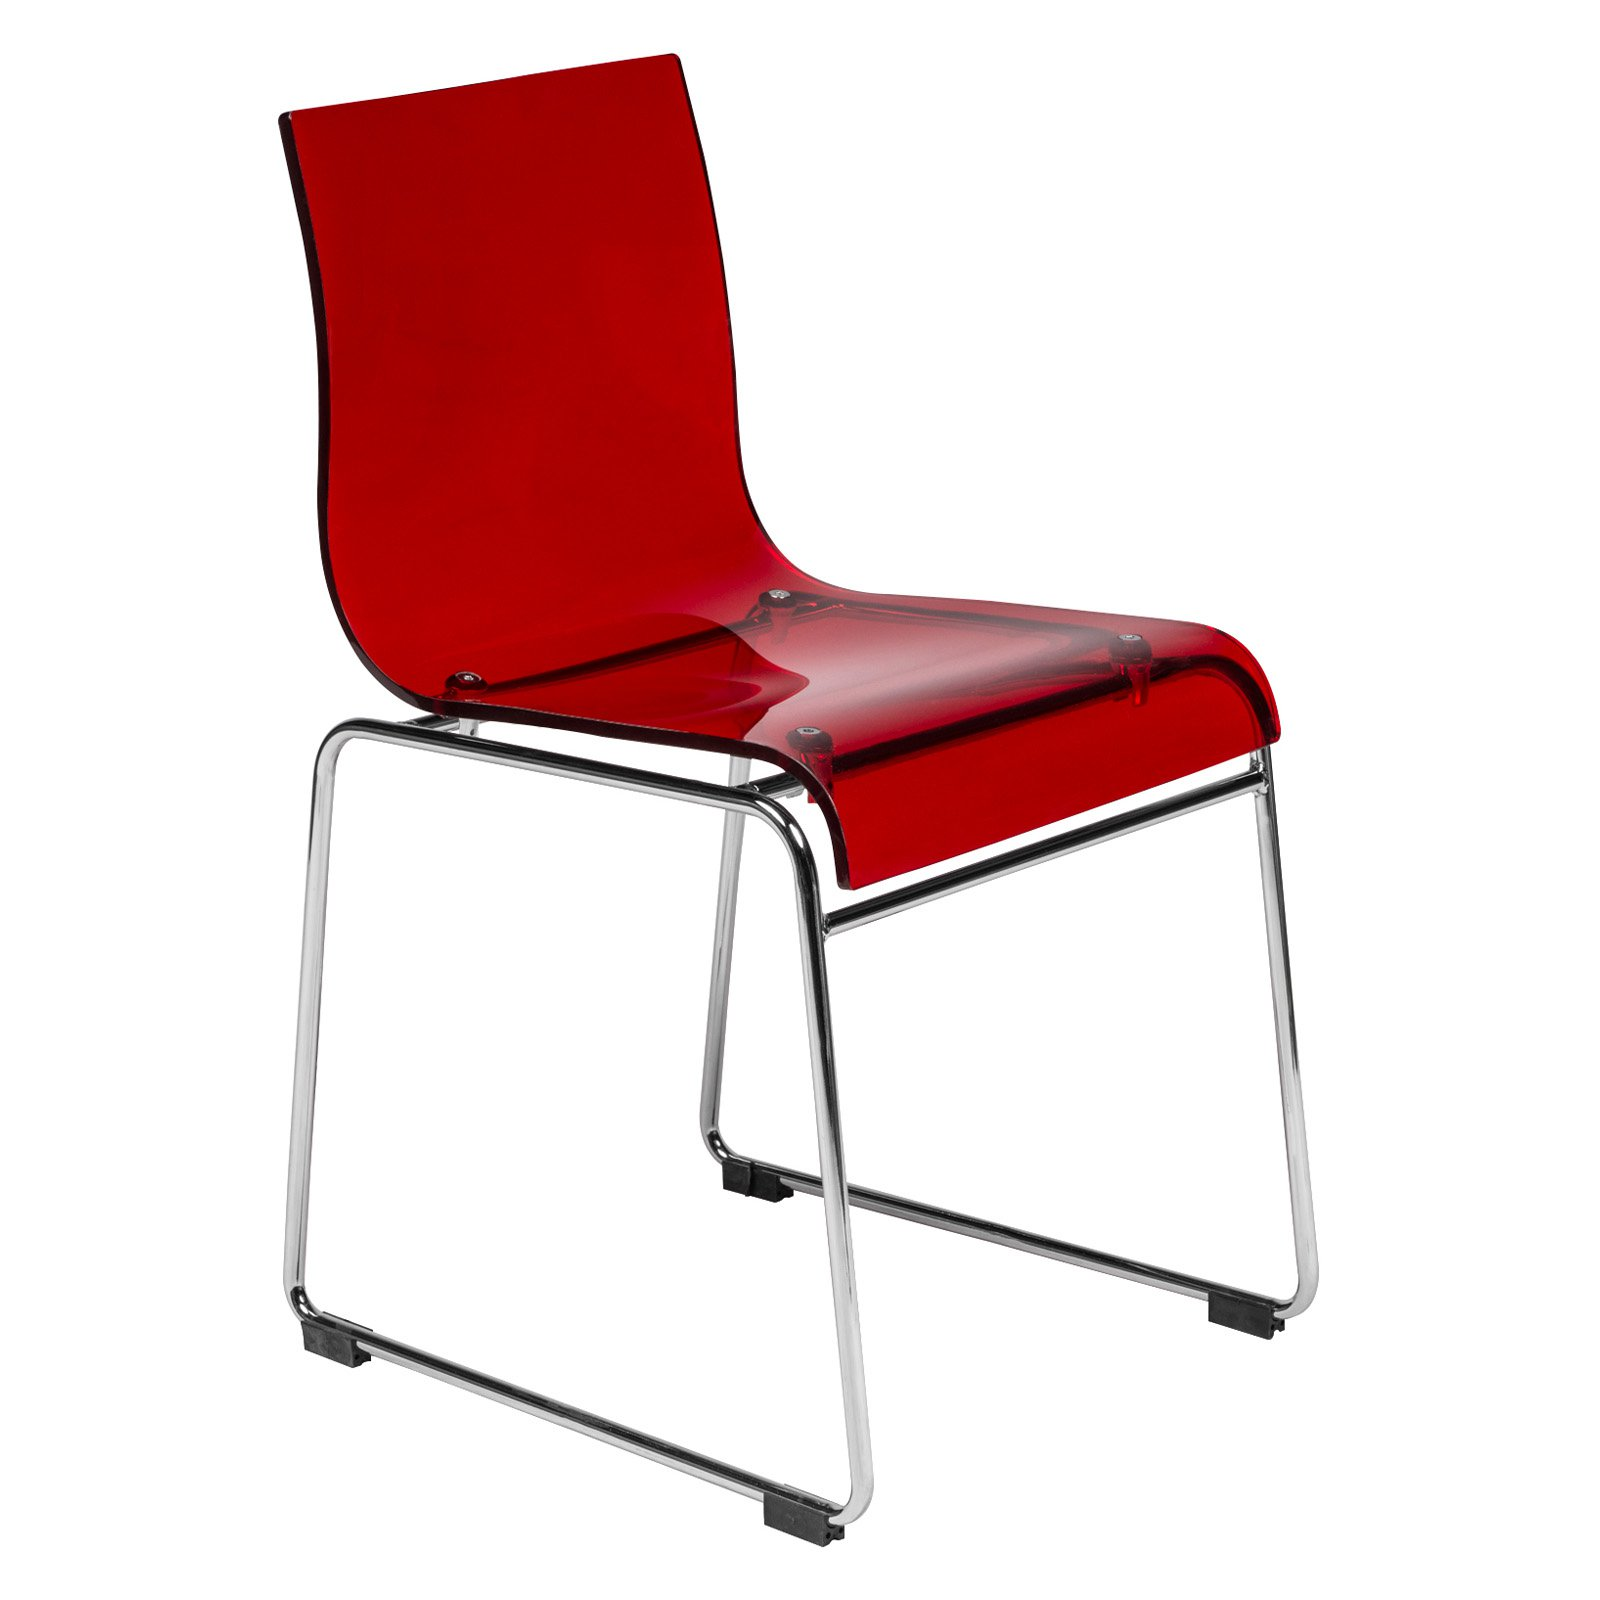 acrylic dining chair white cushion leisuremod lima modern walmart